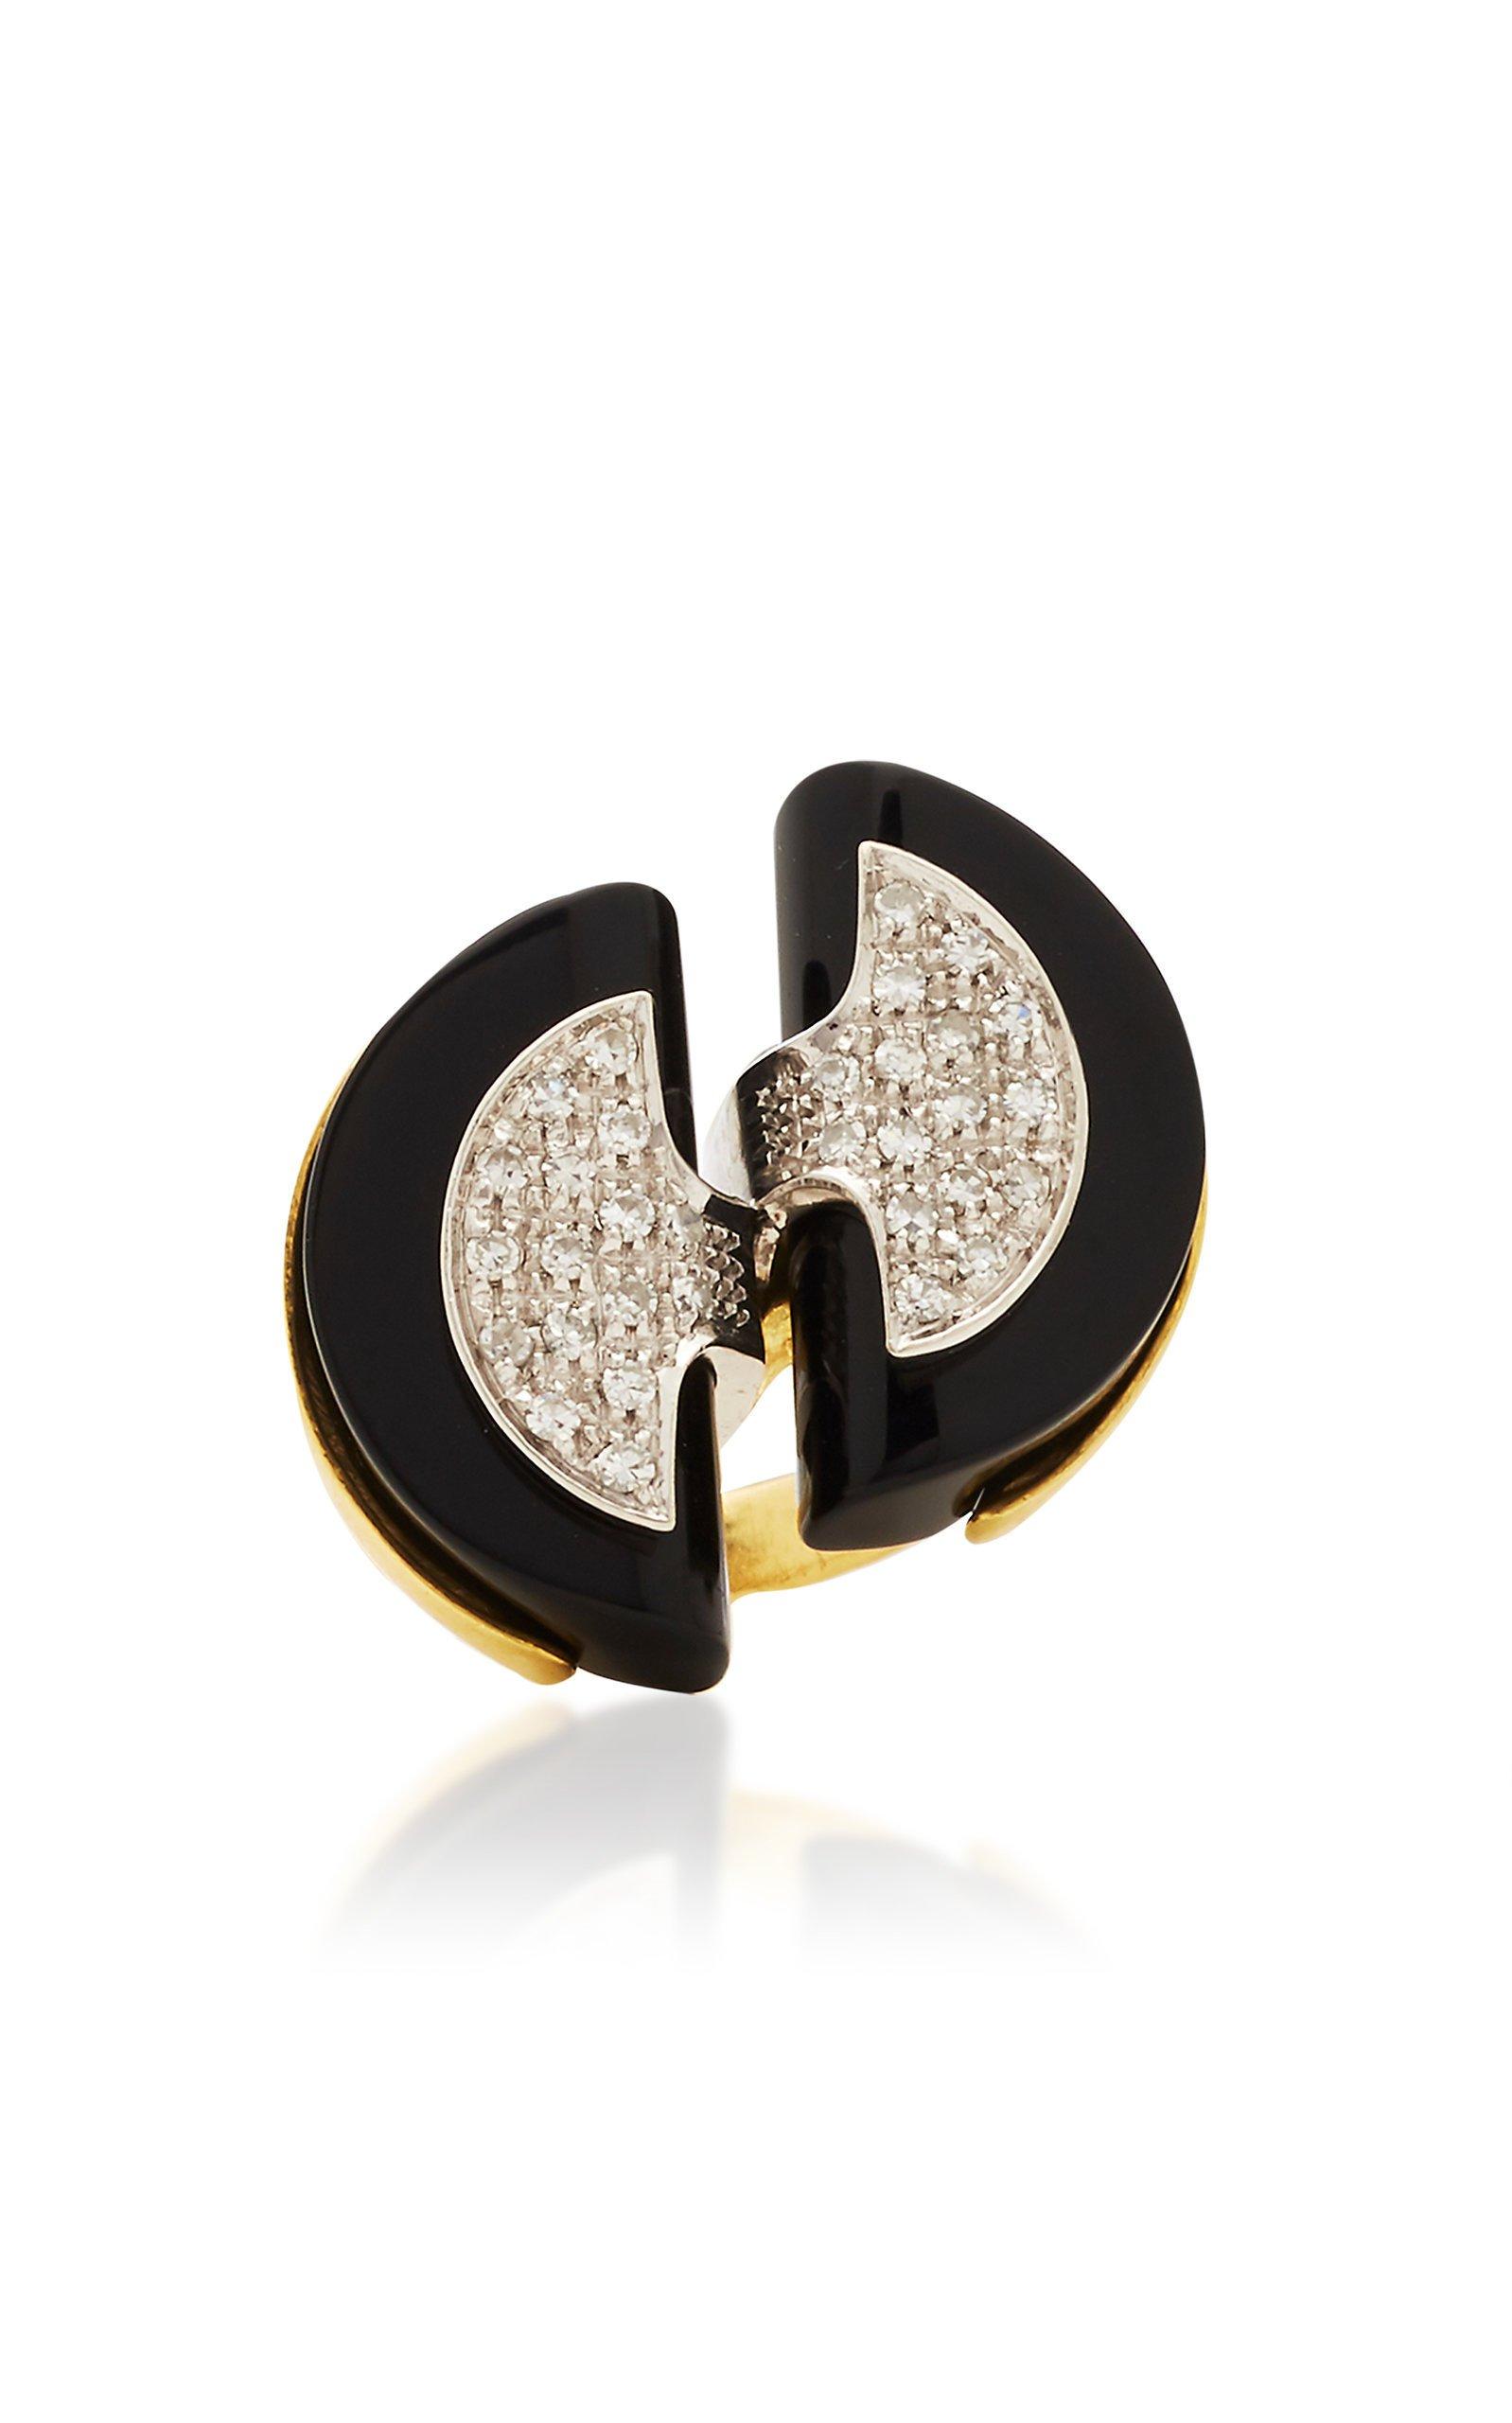 Eleuteri Vintage 18K Yellow Gold Onyx and Diamond Cocktail Ring